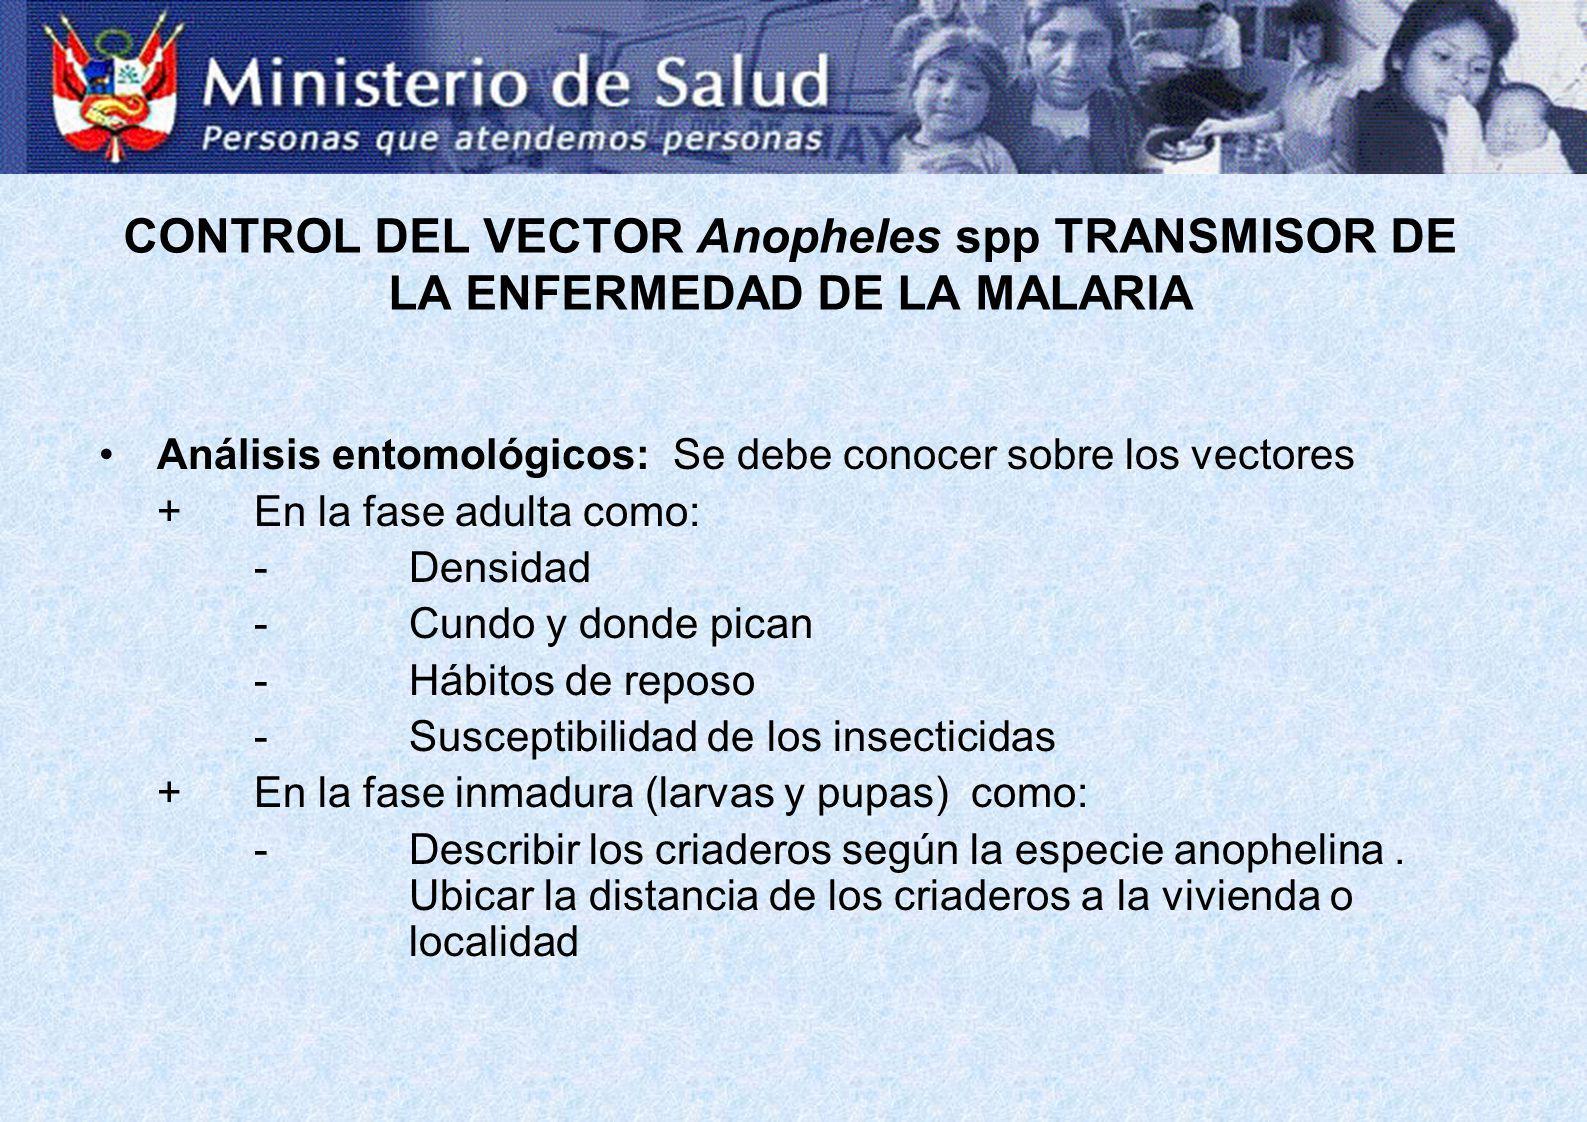 CONTROL DEL VECTOR Anopheles spp TRANSMISOR DE LA ENFERMEDAD DE LA MALARIA